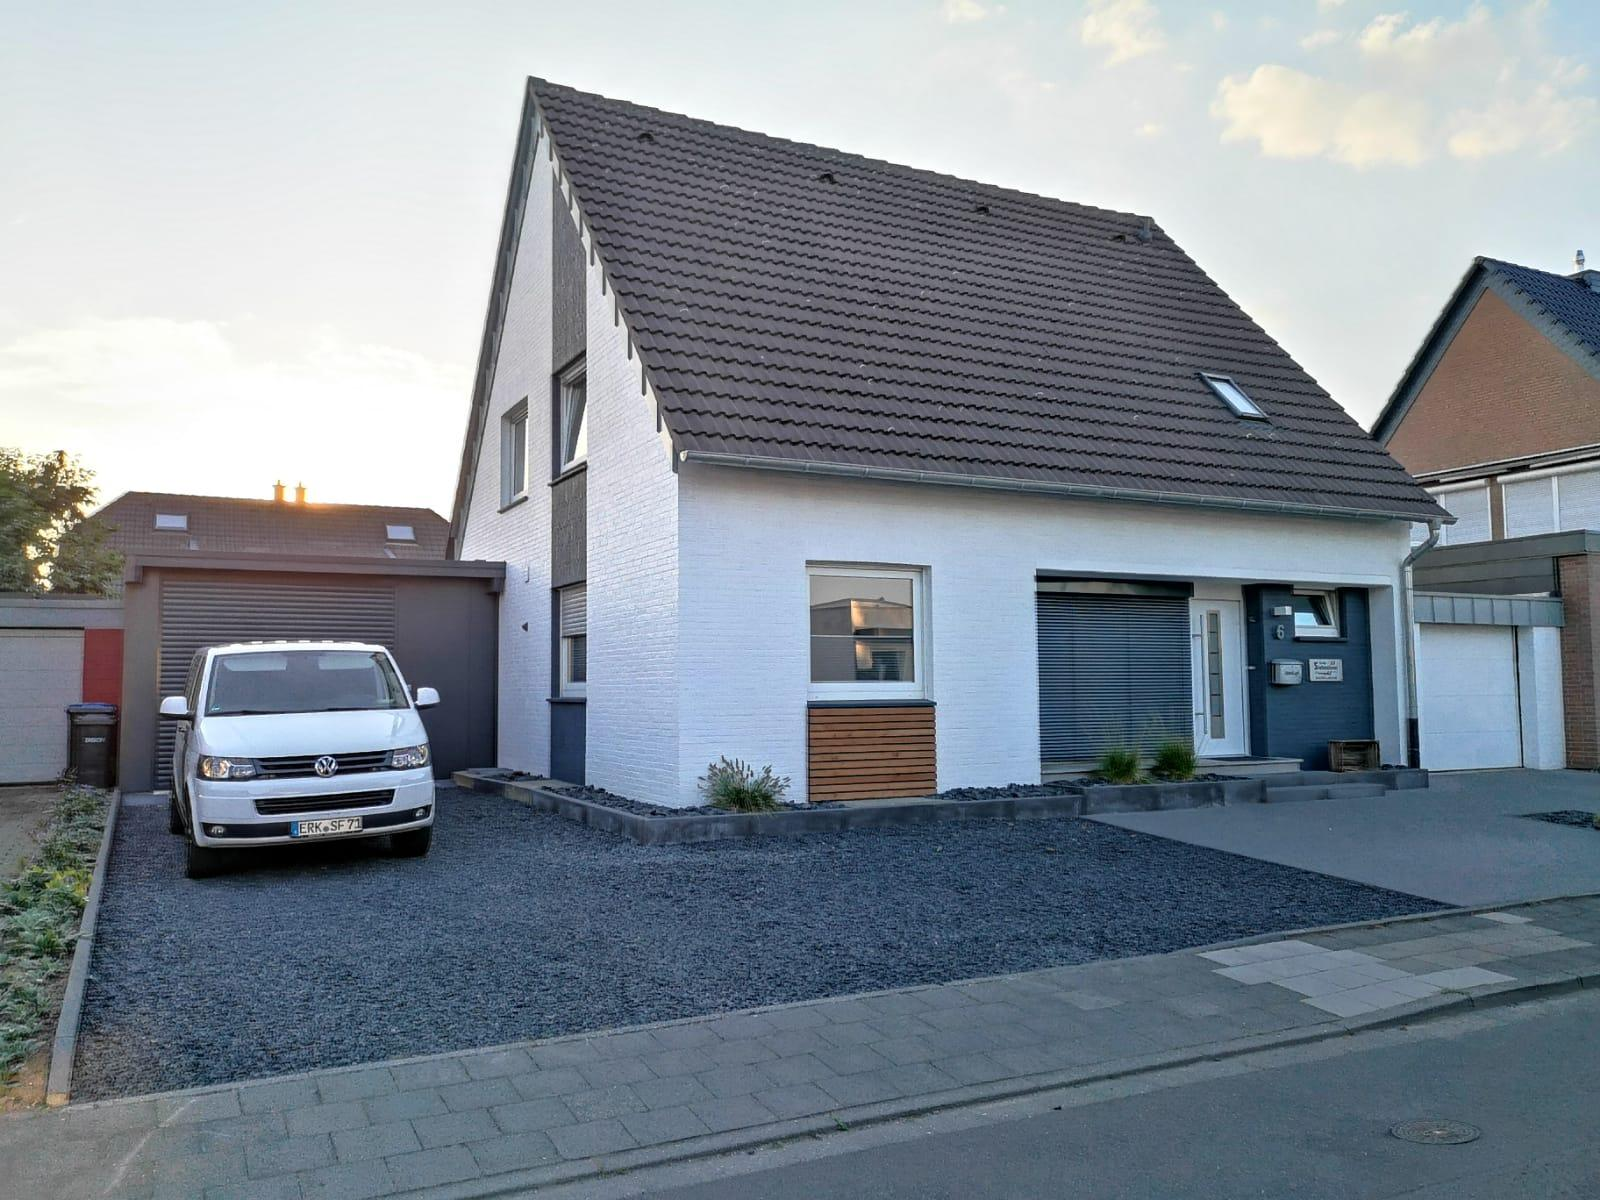 Adresse in Erkelenz